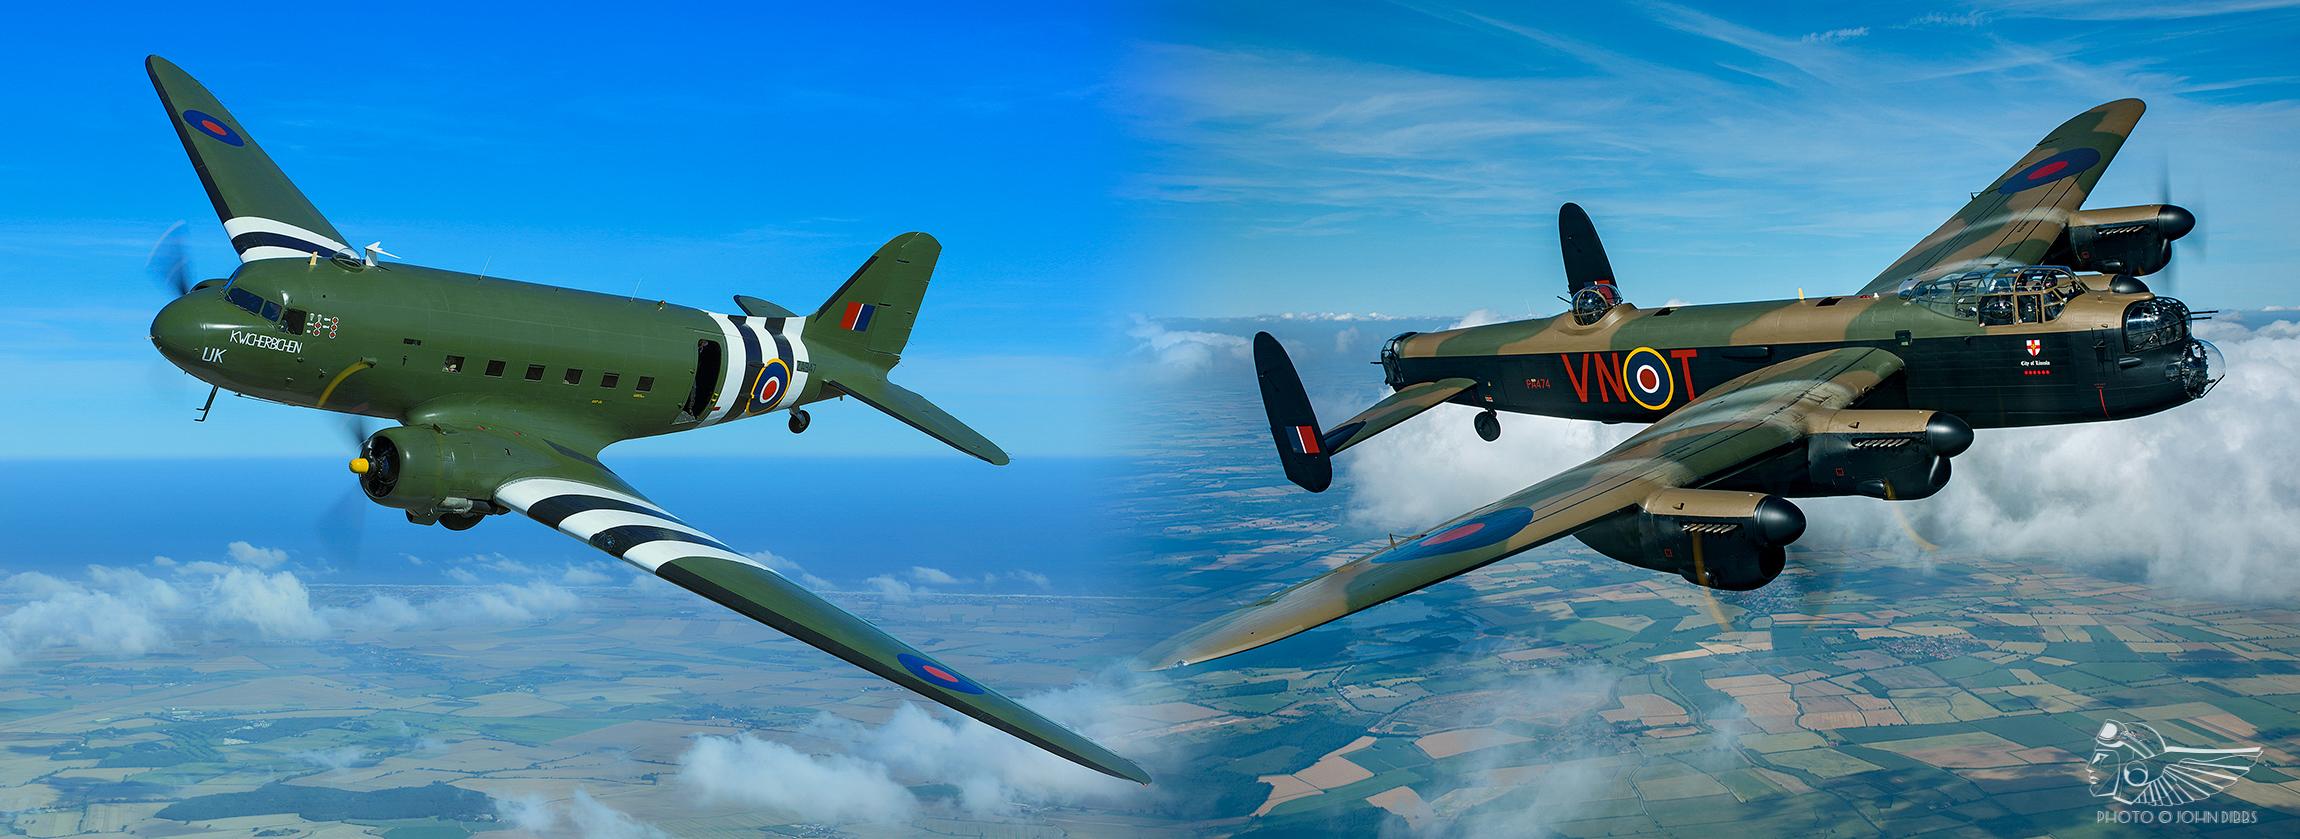 Bringing through the BBMF's modern day Bomber Crews